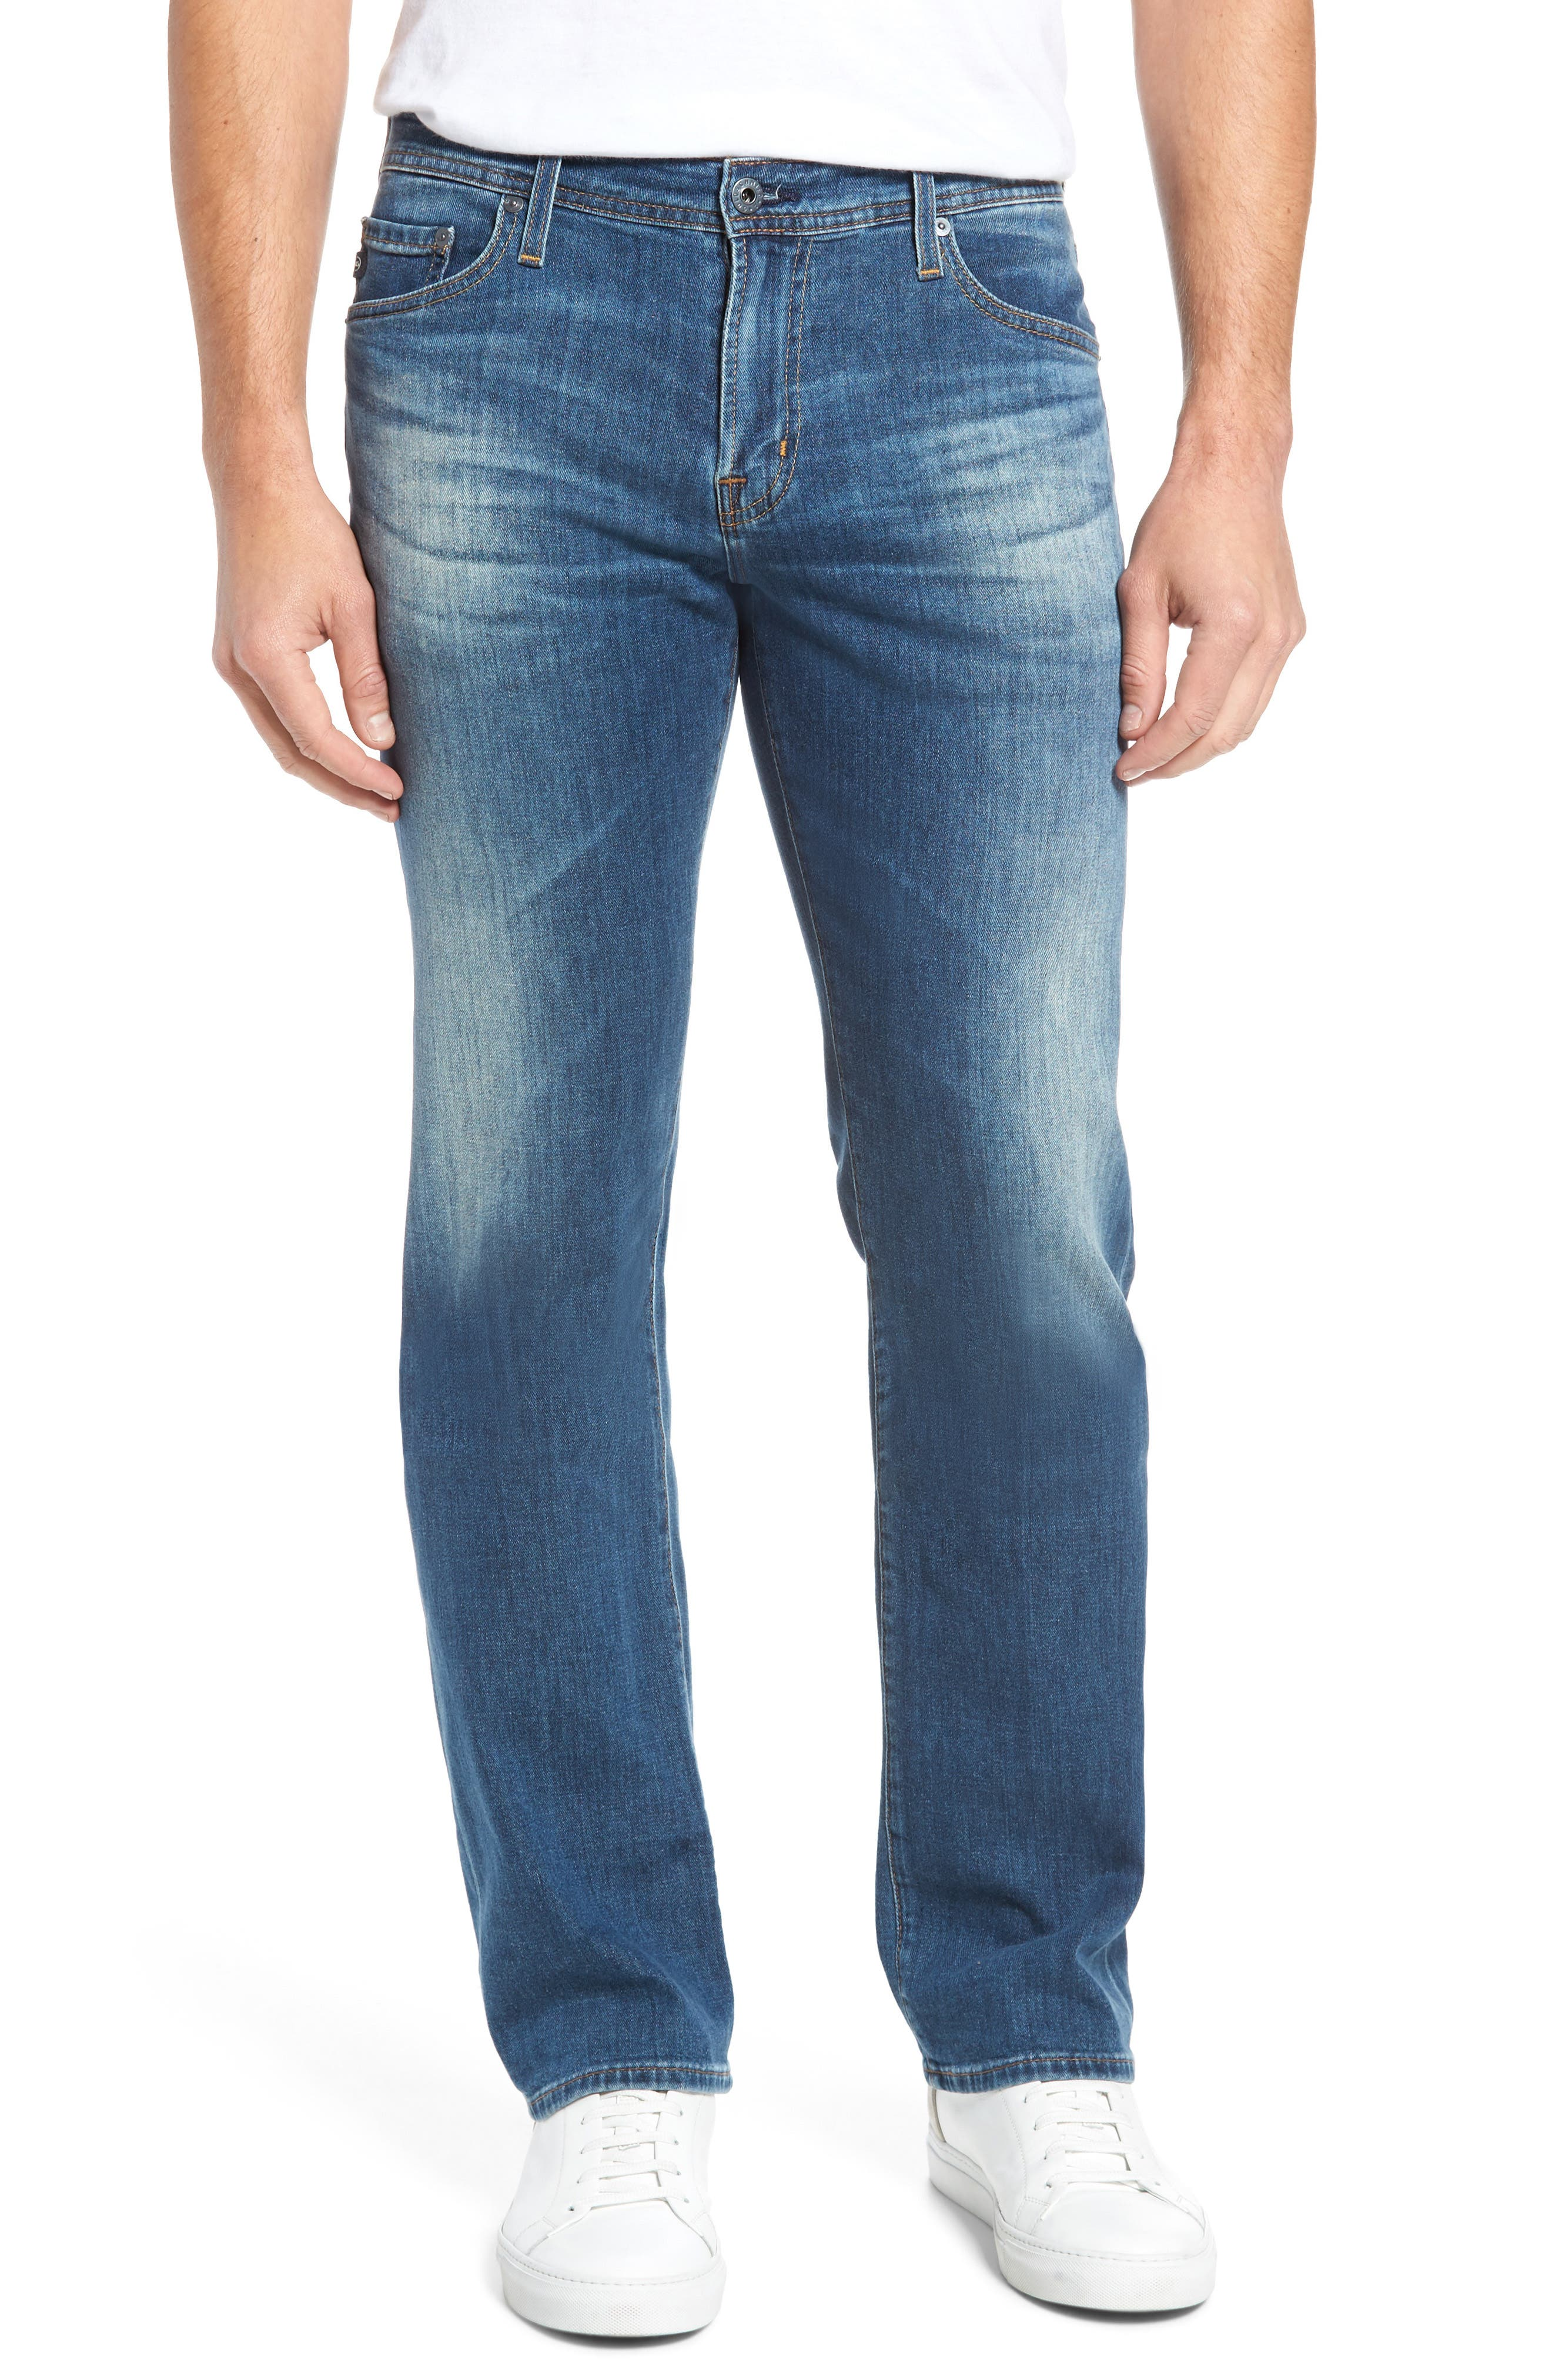 AG Protégé Relaxed Fit Jeans